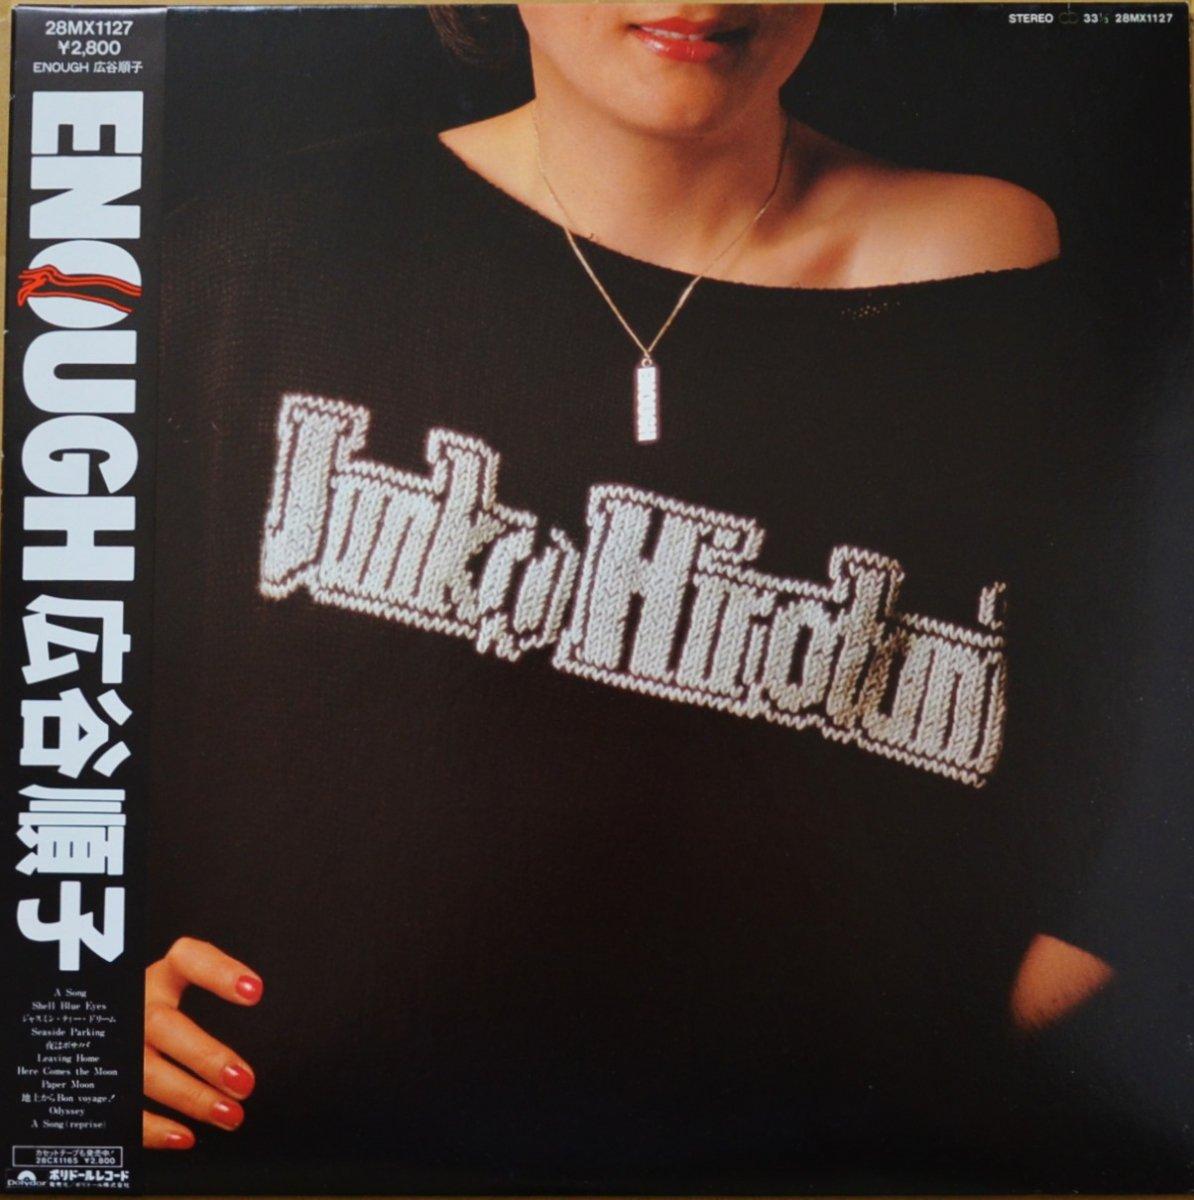 広谷順子 JUNKO HIROTANI /  ENOUGH (LP)